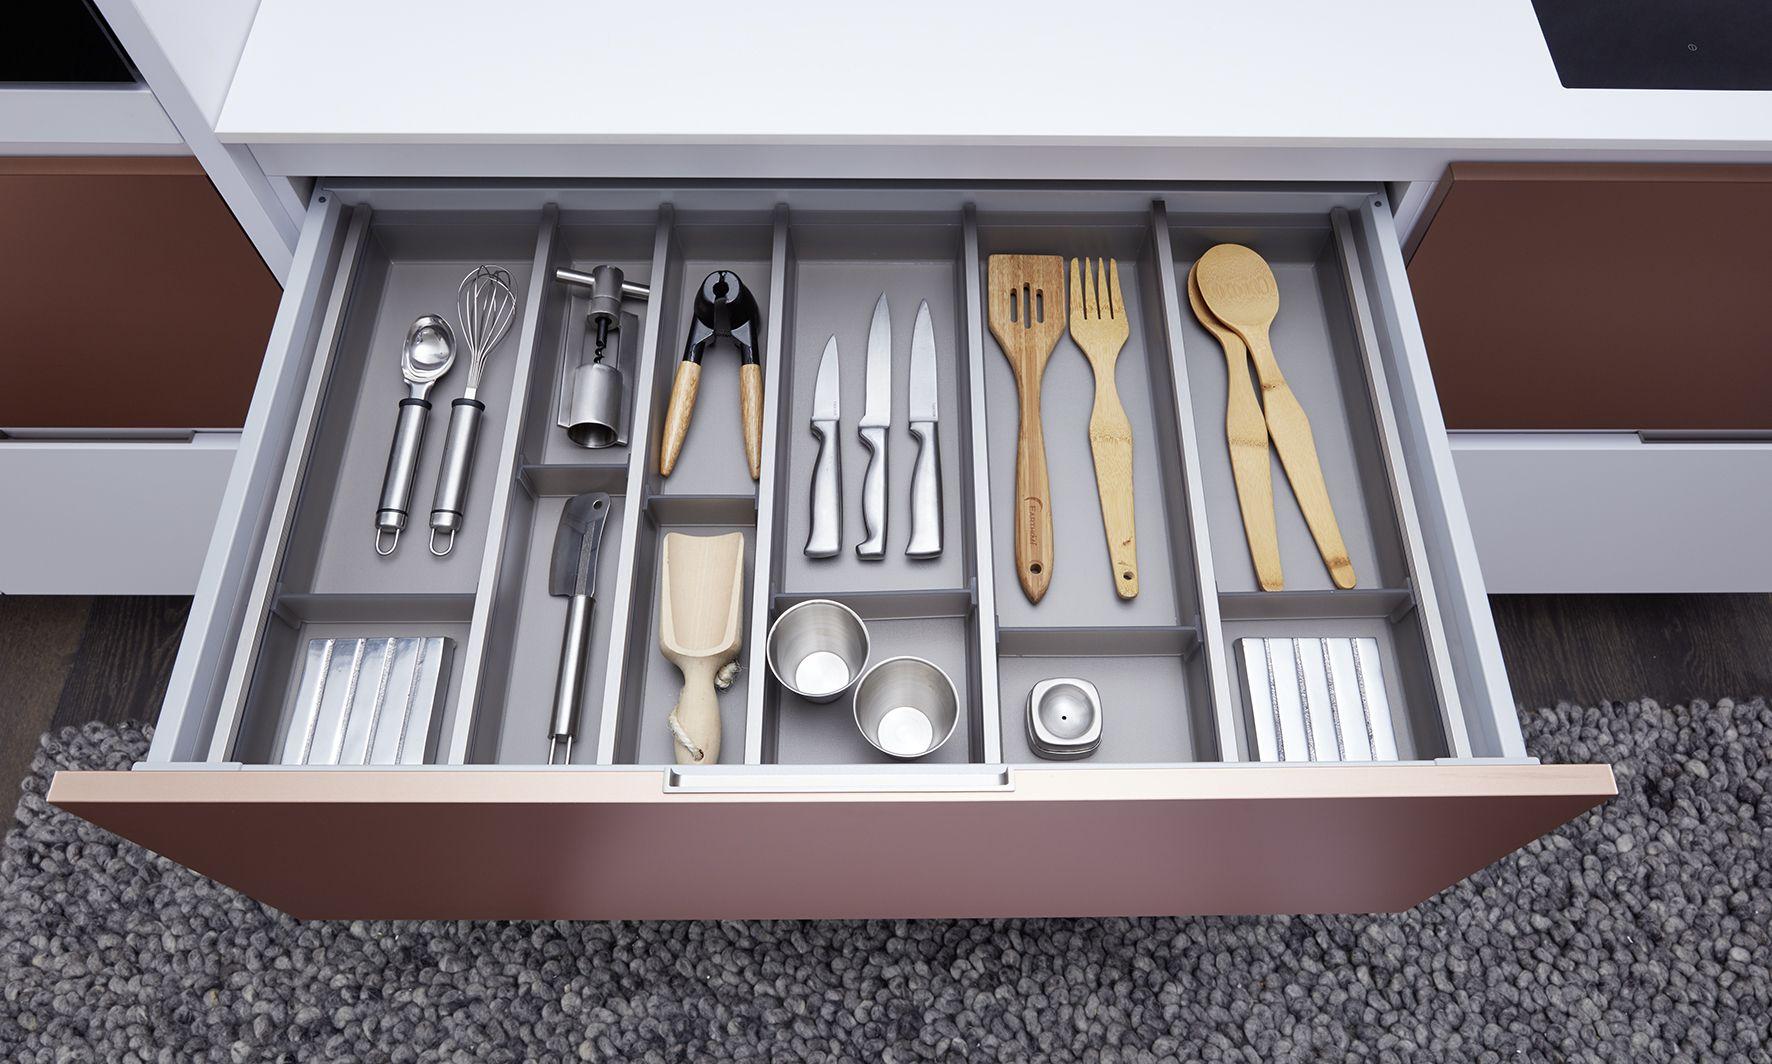 Rose Gold Kitchen玫瑰金廚房 德國全原裝進口 廚房設計